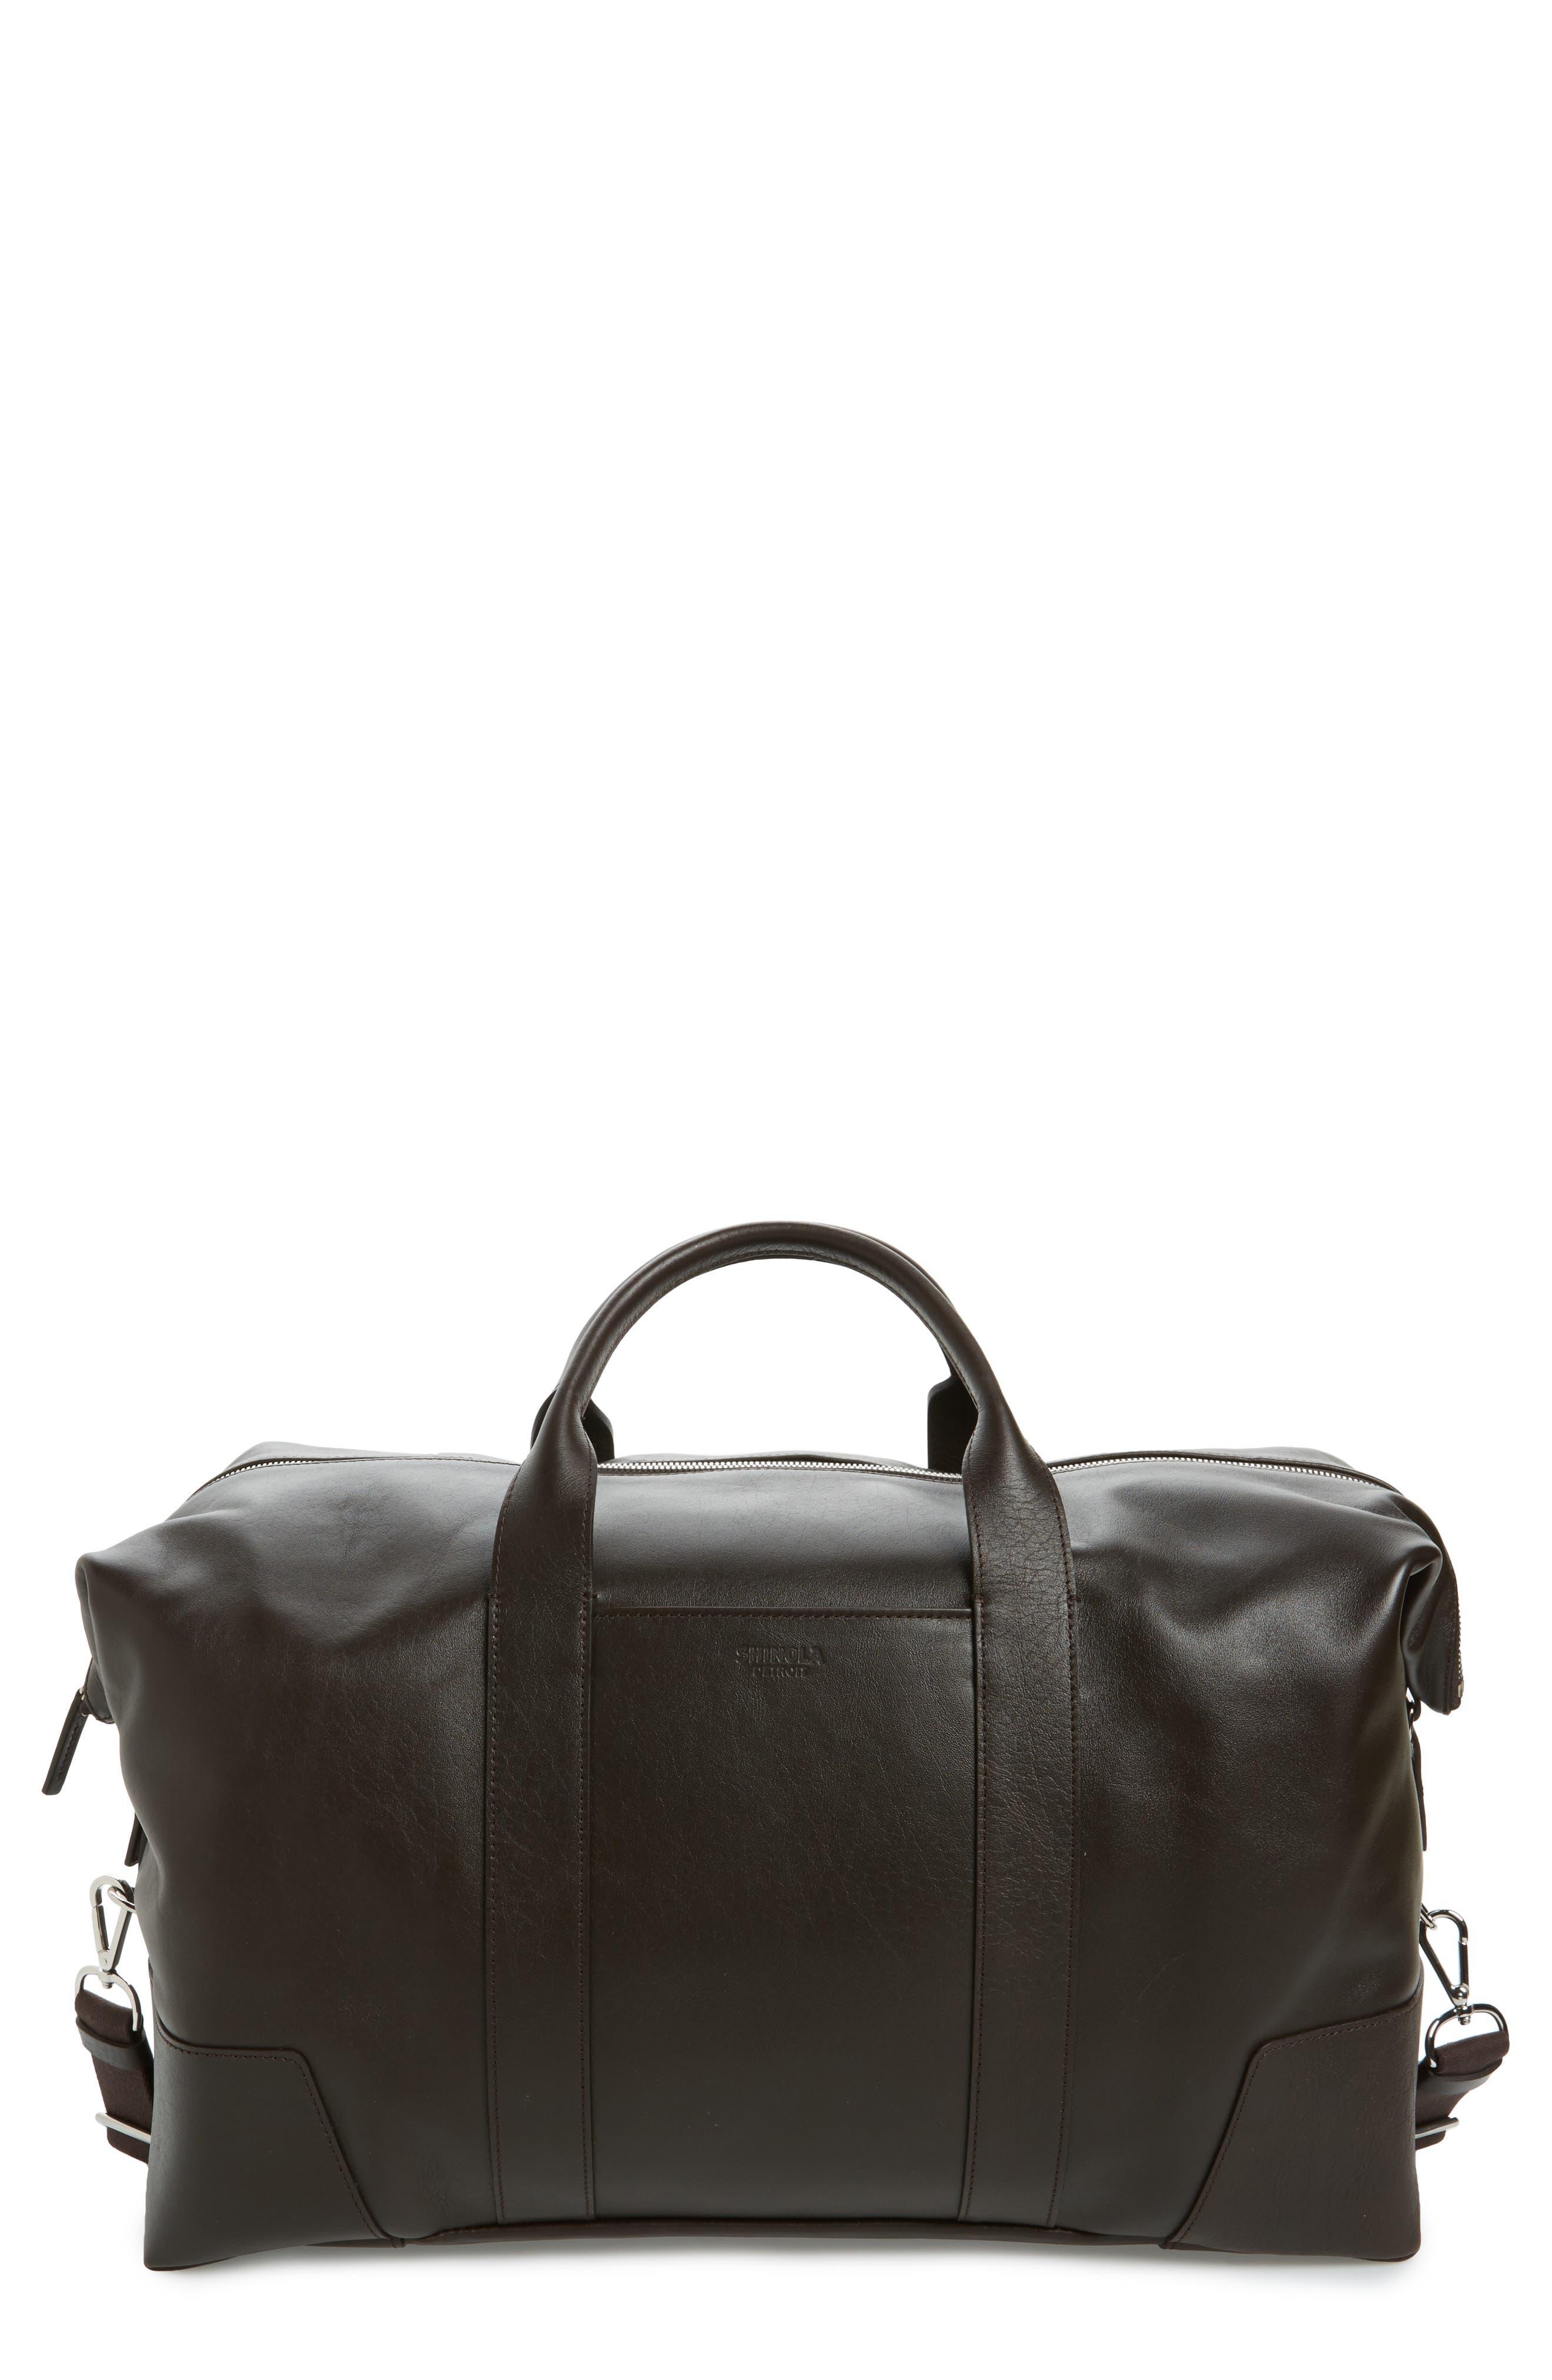 Signature Leather Duffel Bag,                         Main,                         color, DEEP BROWN